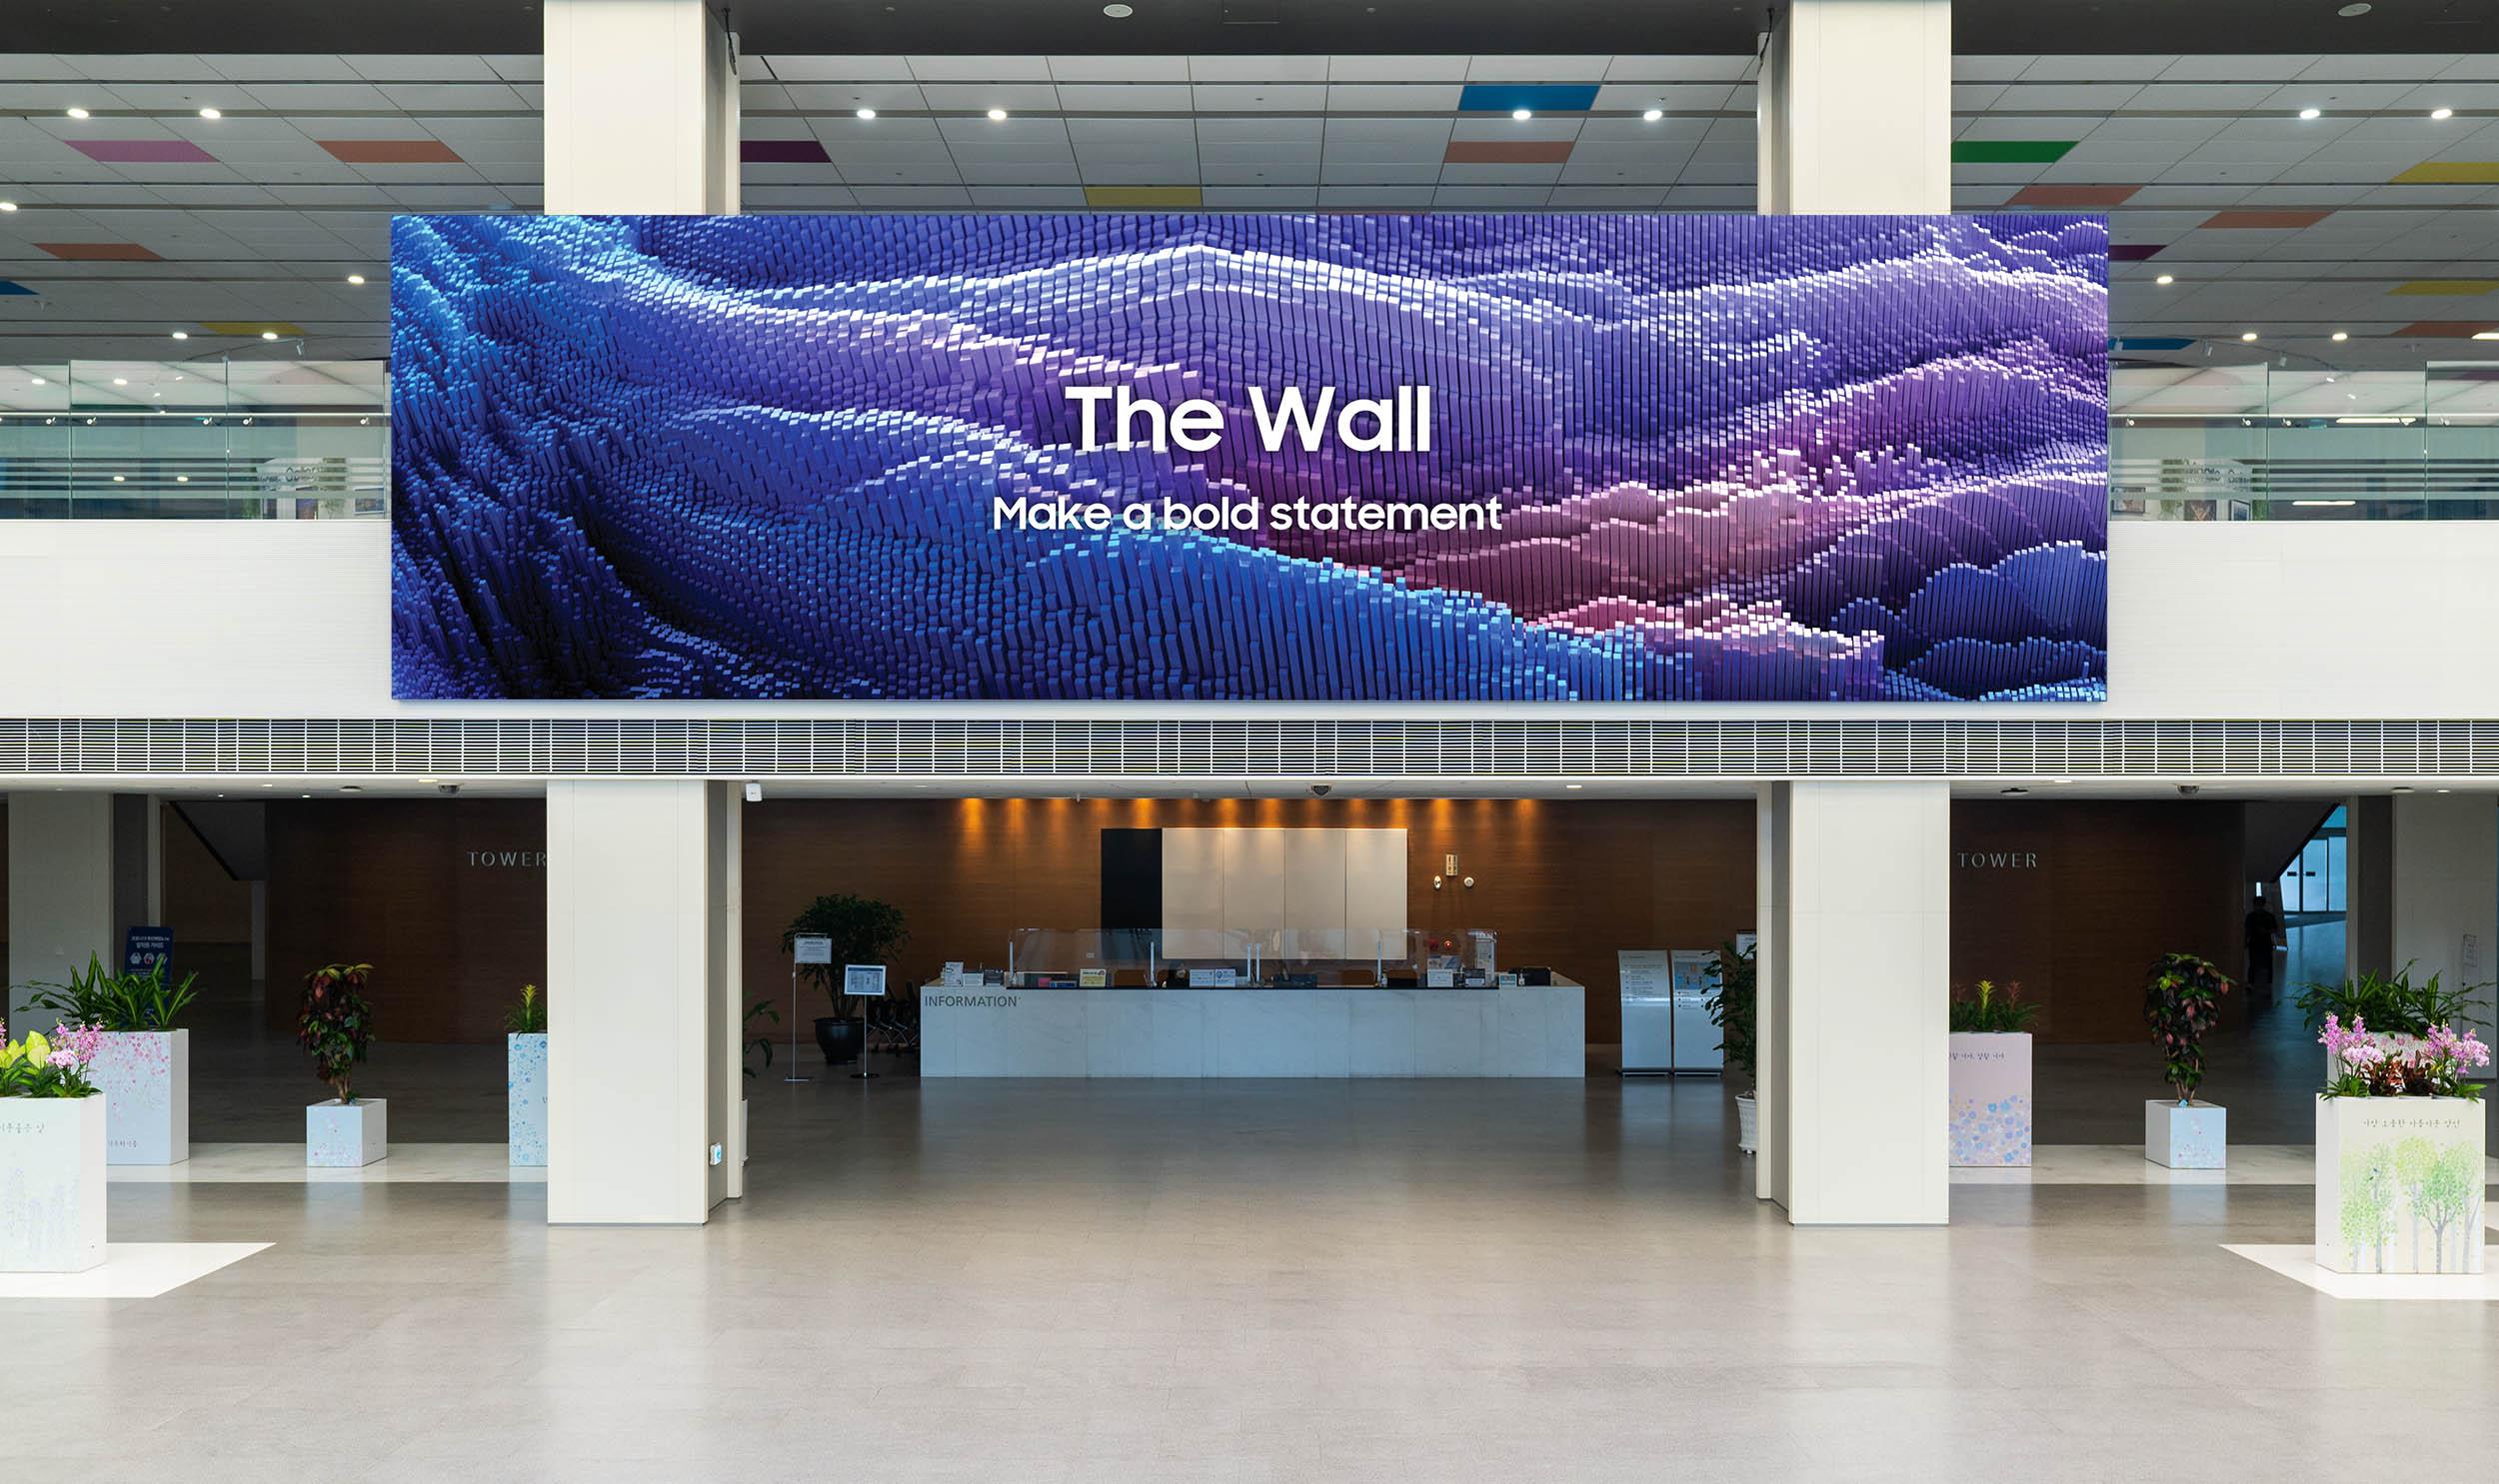 The Wall 2021 (Fotos: Samsung)